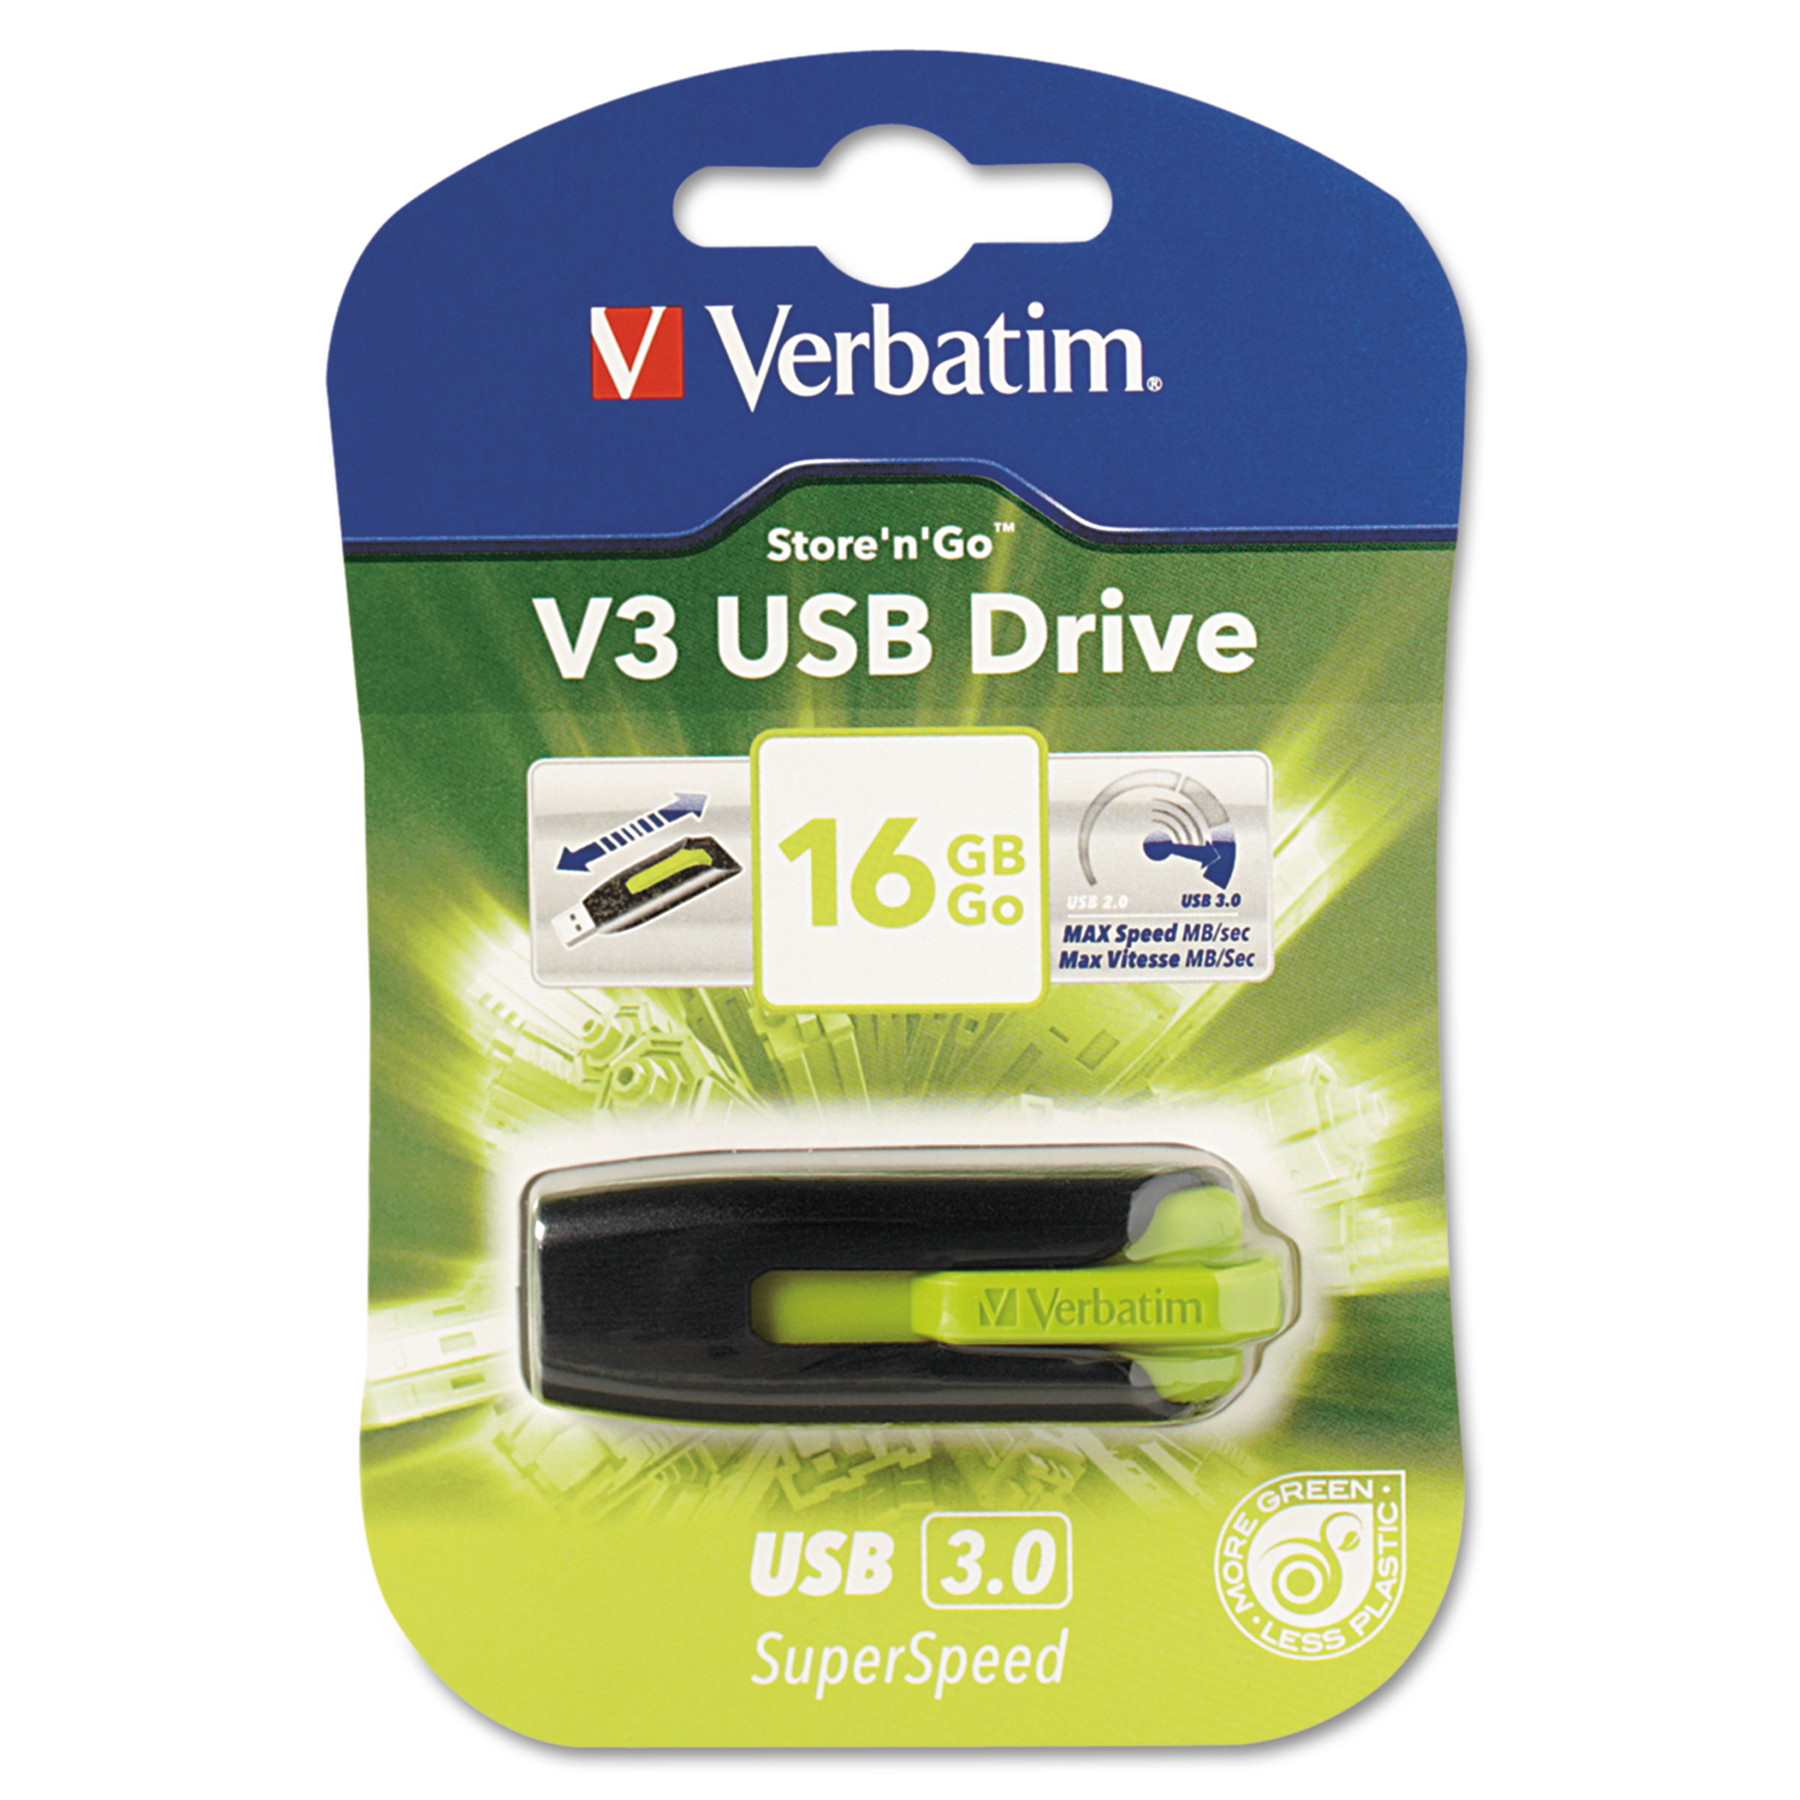 Verbatim Store 'n' Go V3 USB 3.0 Drive, 16GB, Black/Green -VER49177